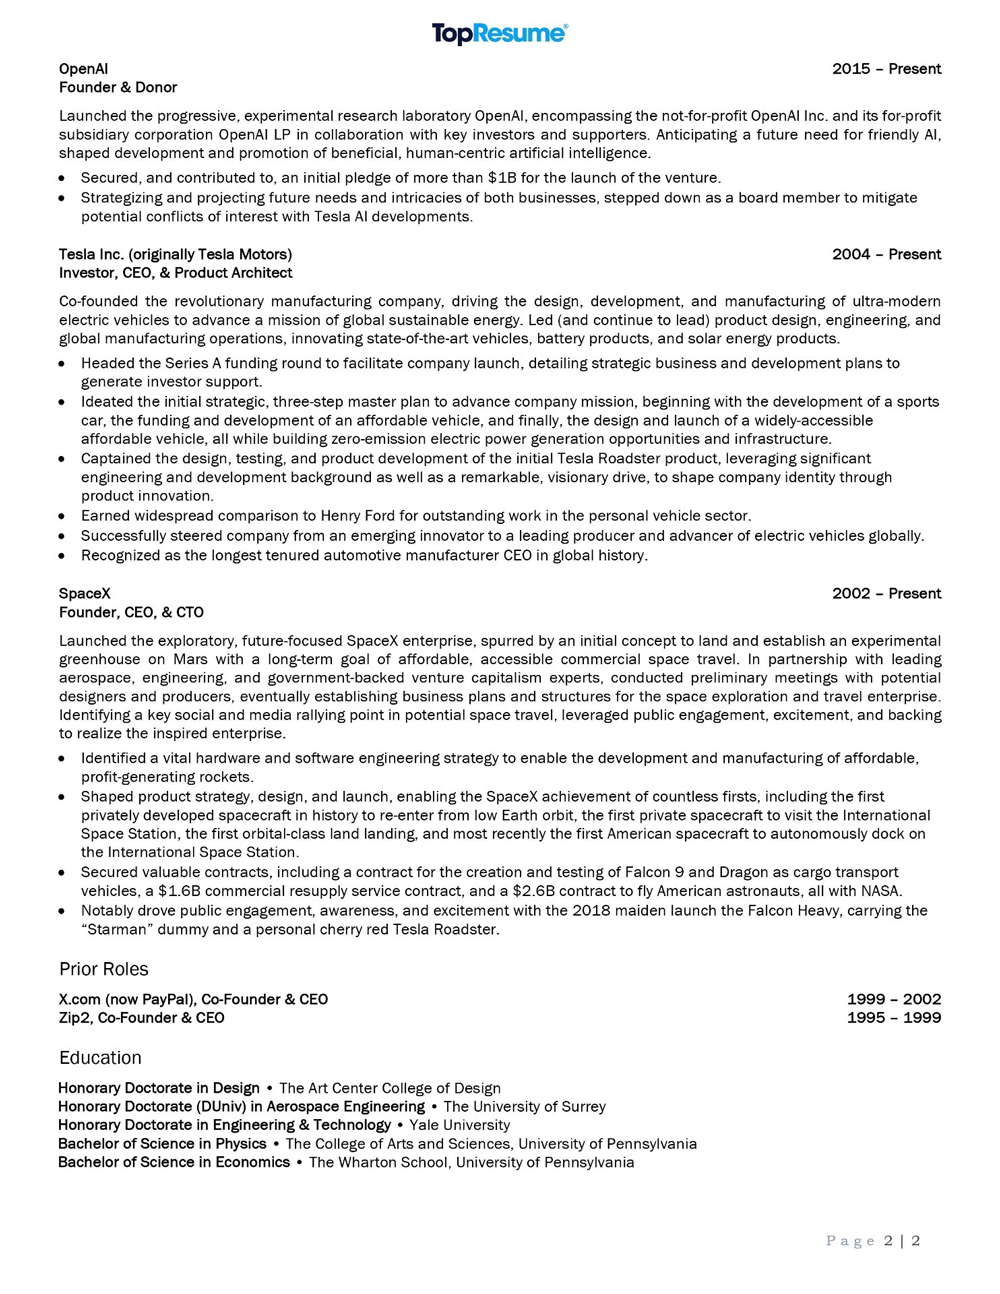 Elon Musk's Resume 2